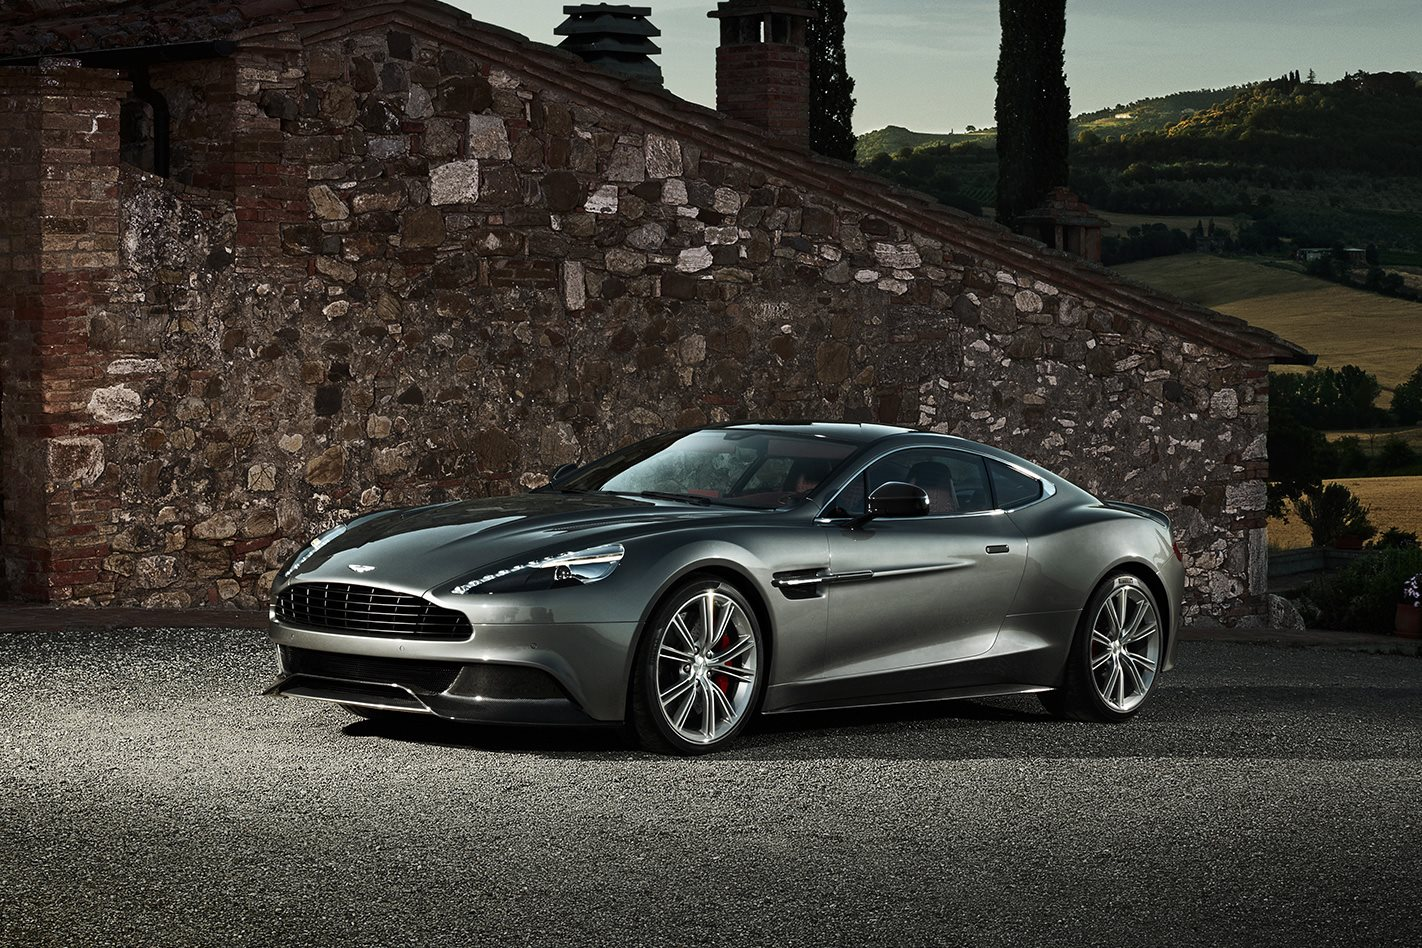 2012-Aston-Martin-Vanquish-exterior.jpg